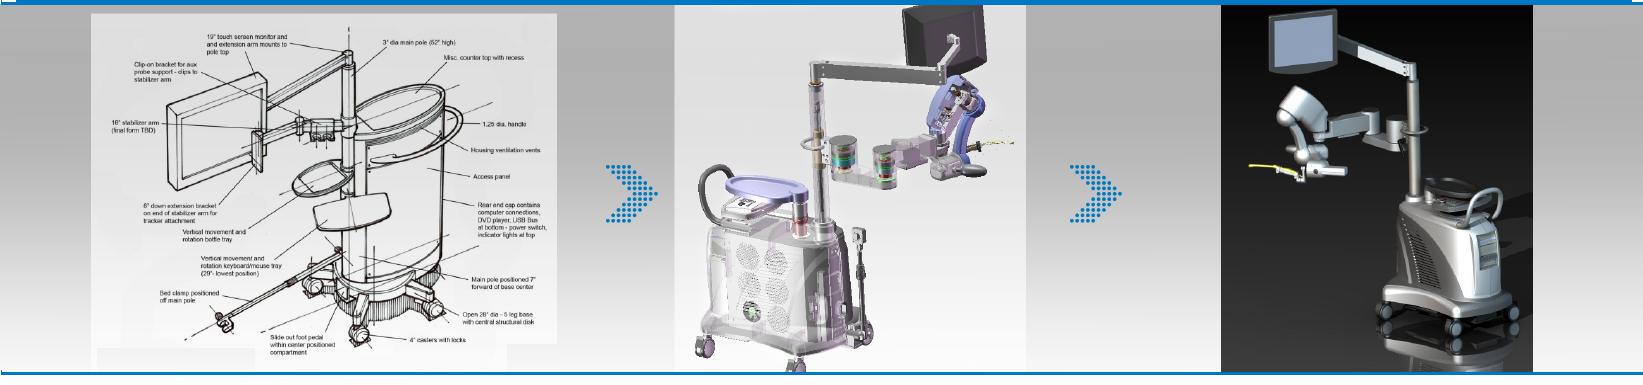 Patient Monitors Advanced